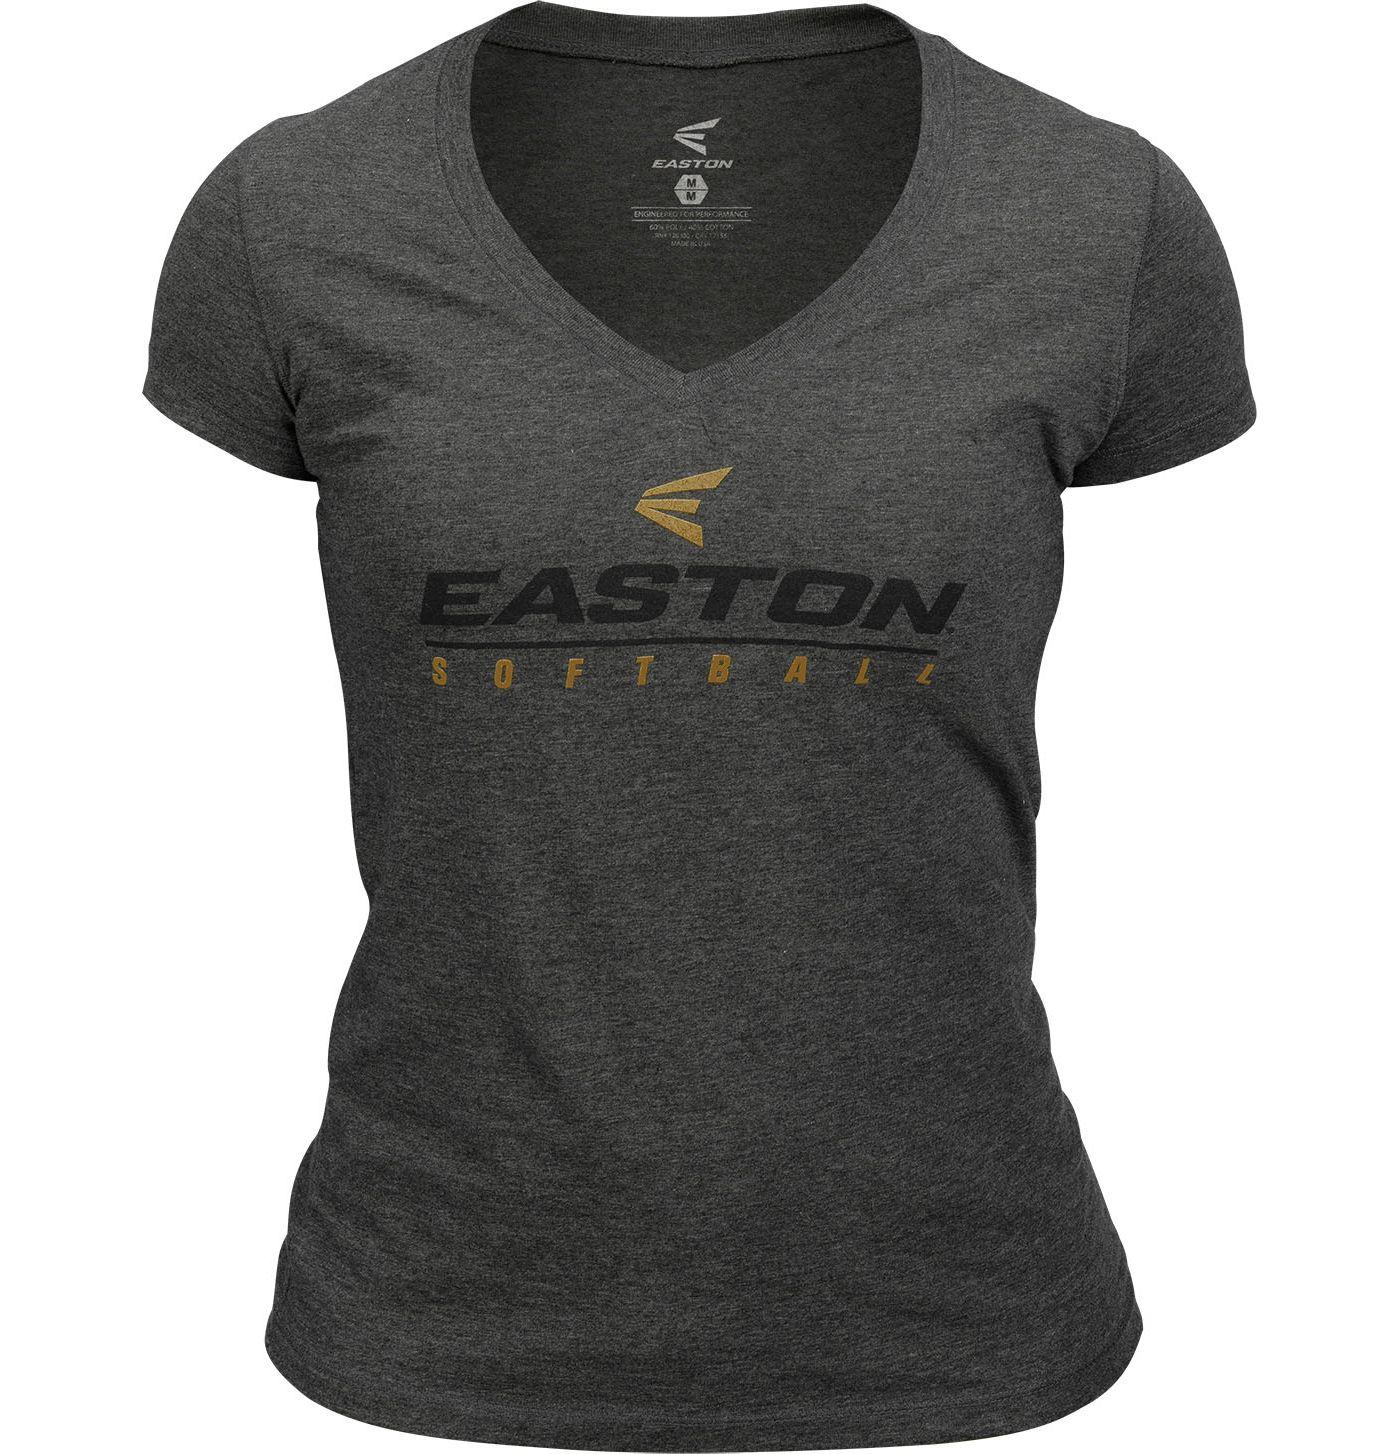 Easton Women's Softball T-Shirt